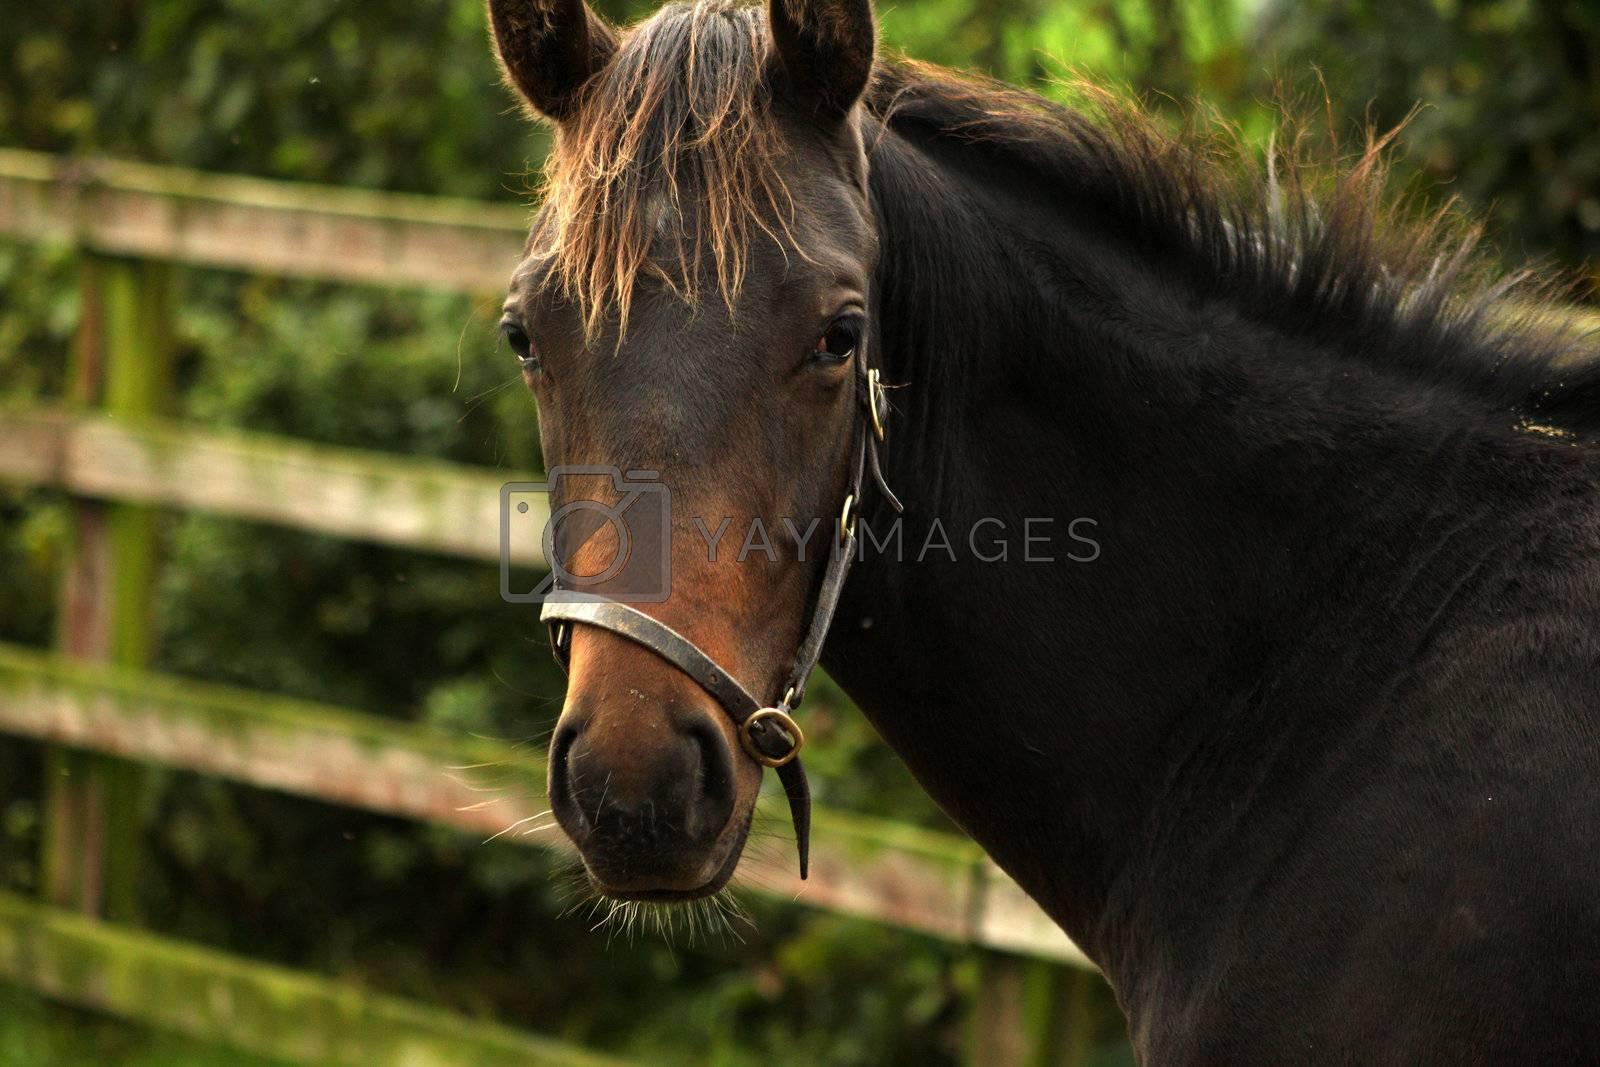 Thoroughbread horse in field in a close up shot